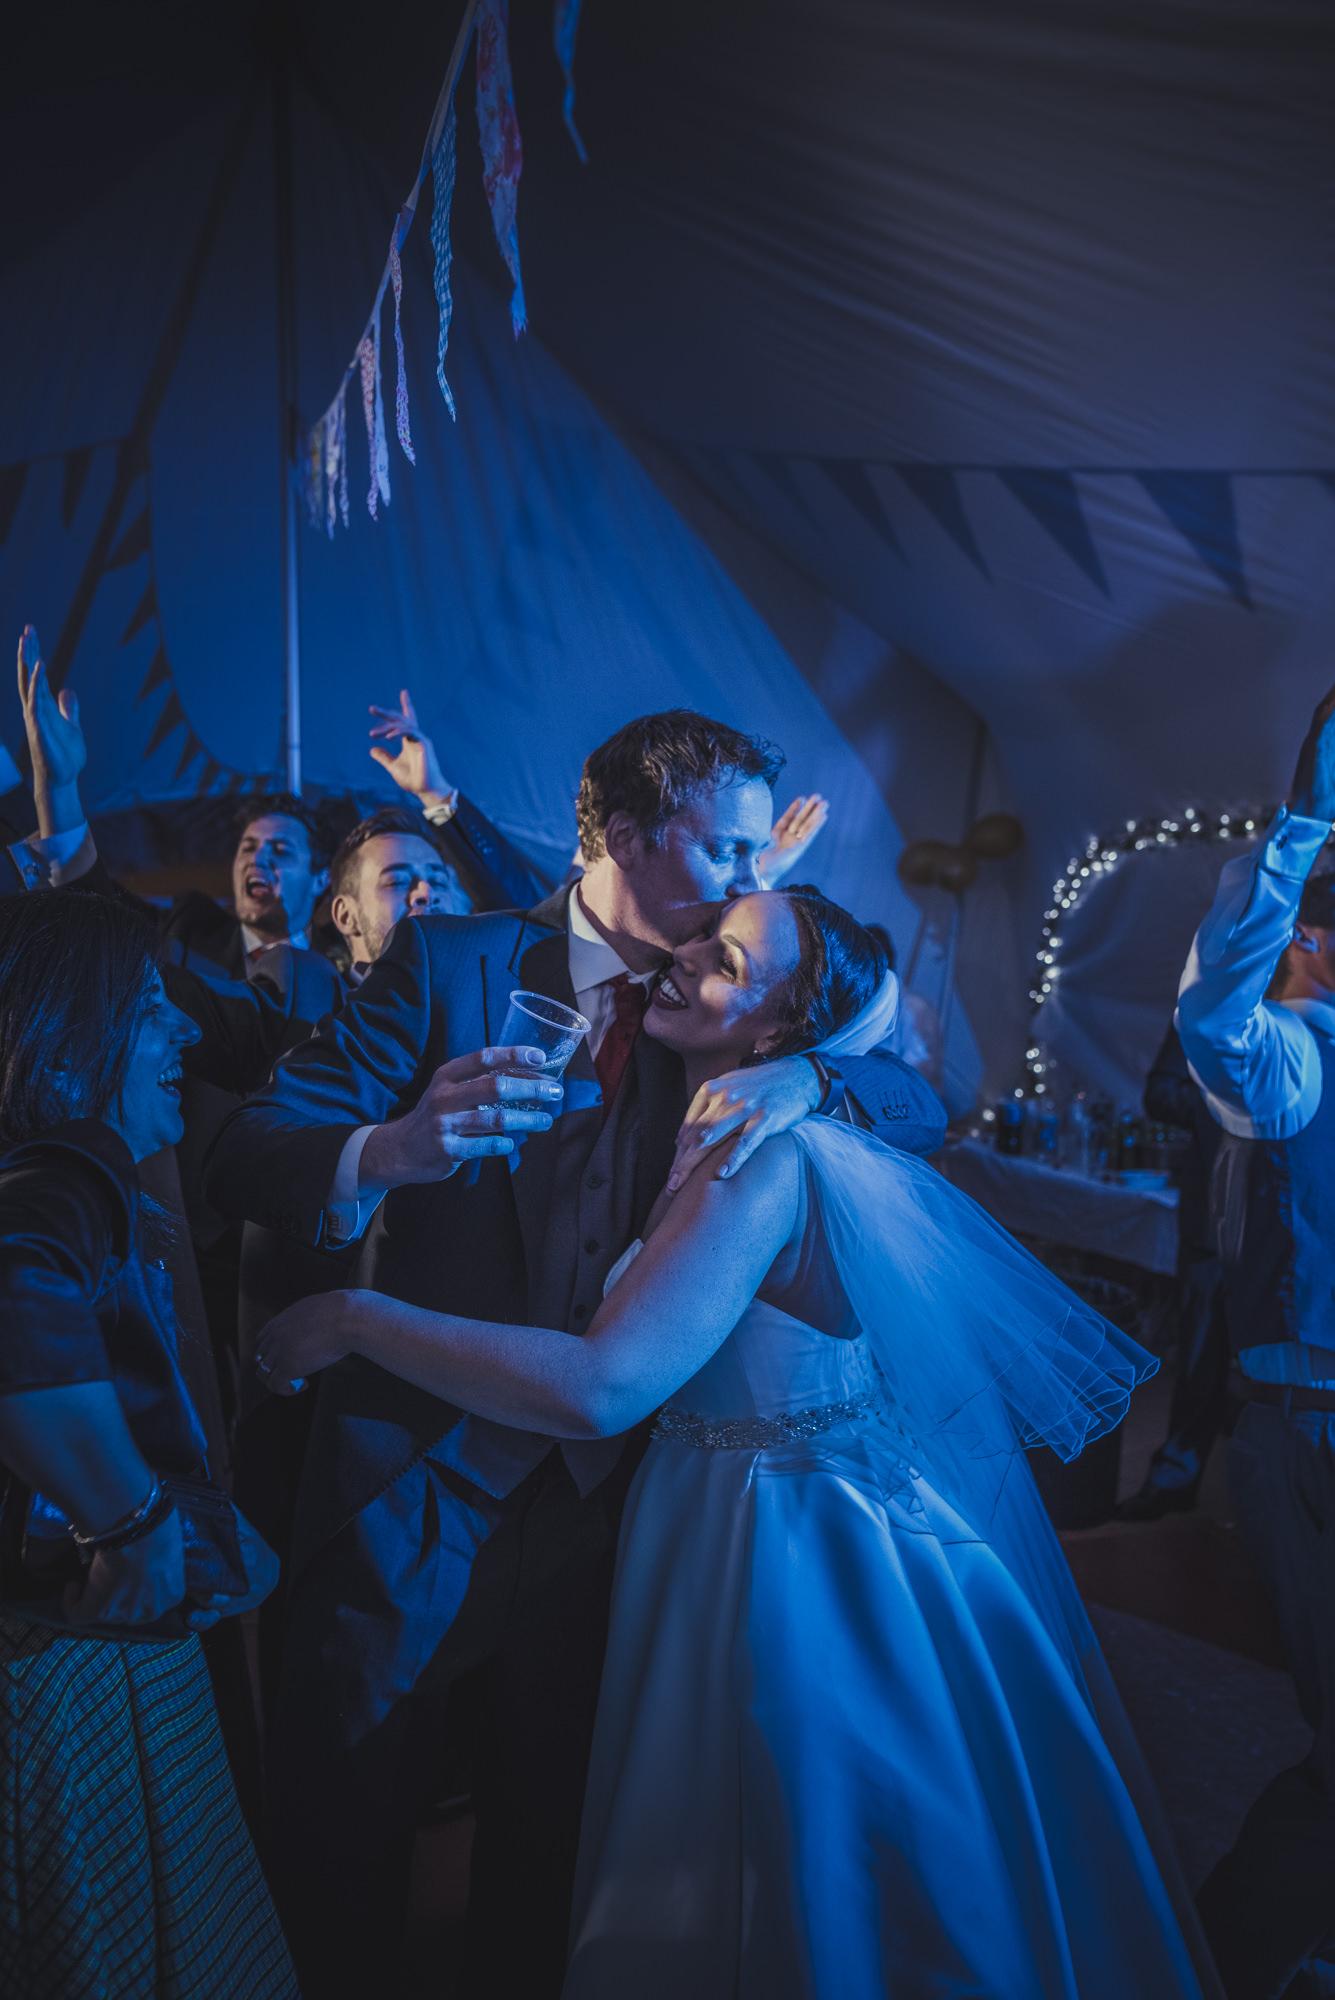 Jacqueline-Gareth-Wedding-Westmead-Events-Surrey-Manu-Mendoza-Wedding-Photography-525.jpg